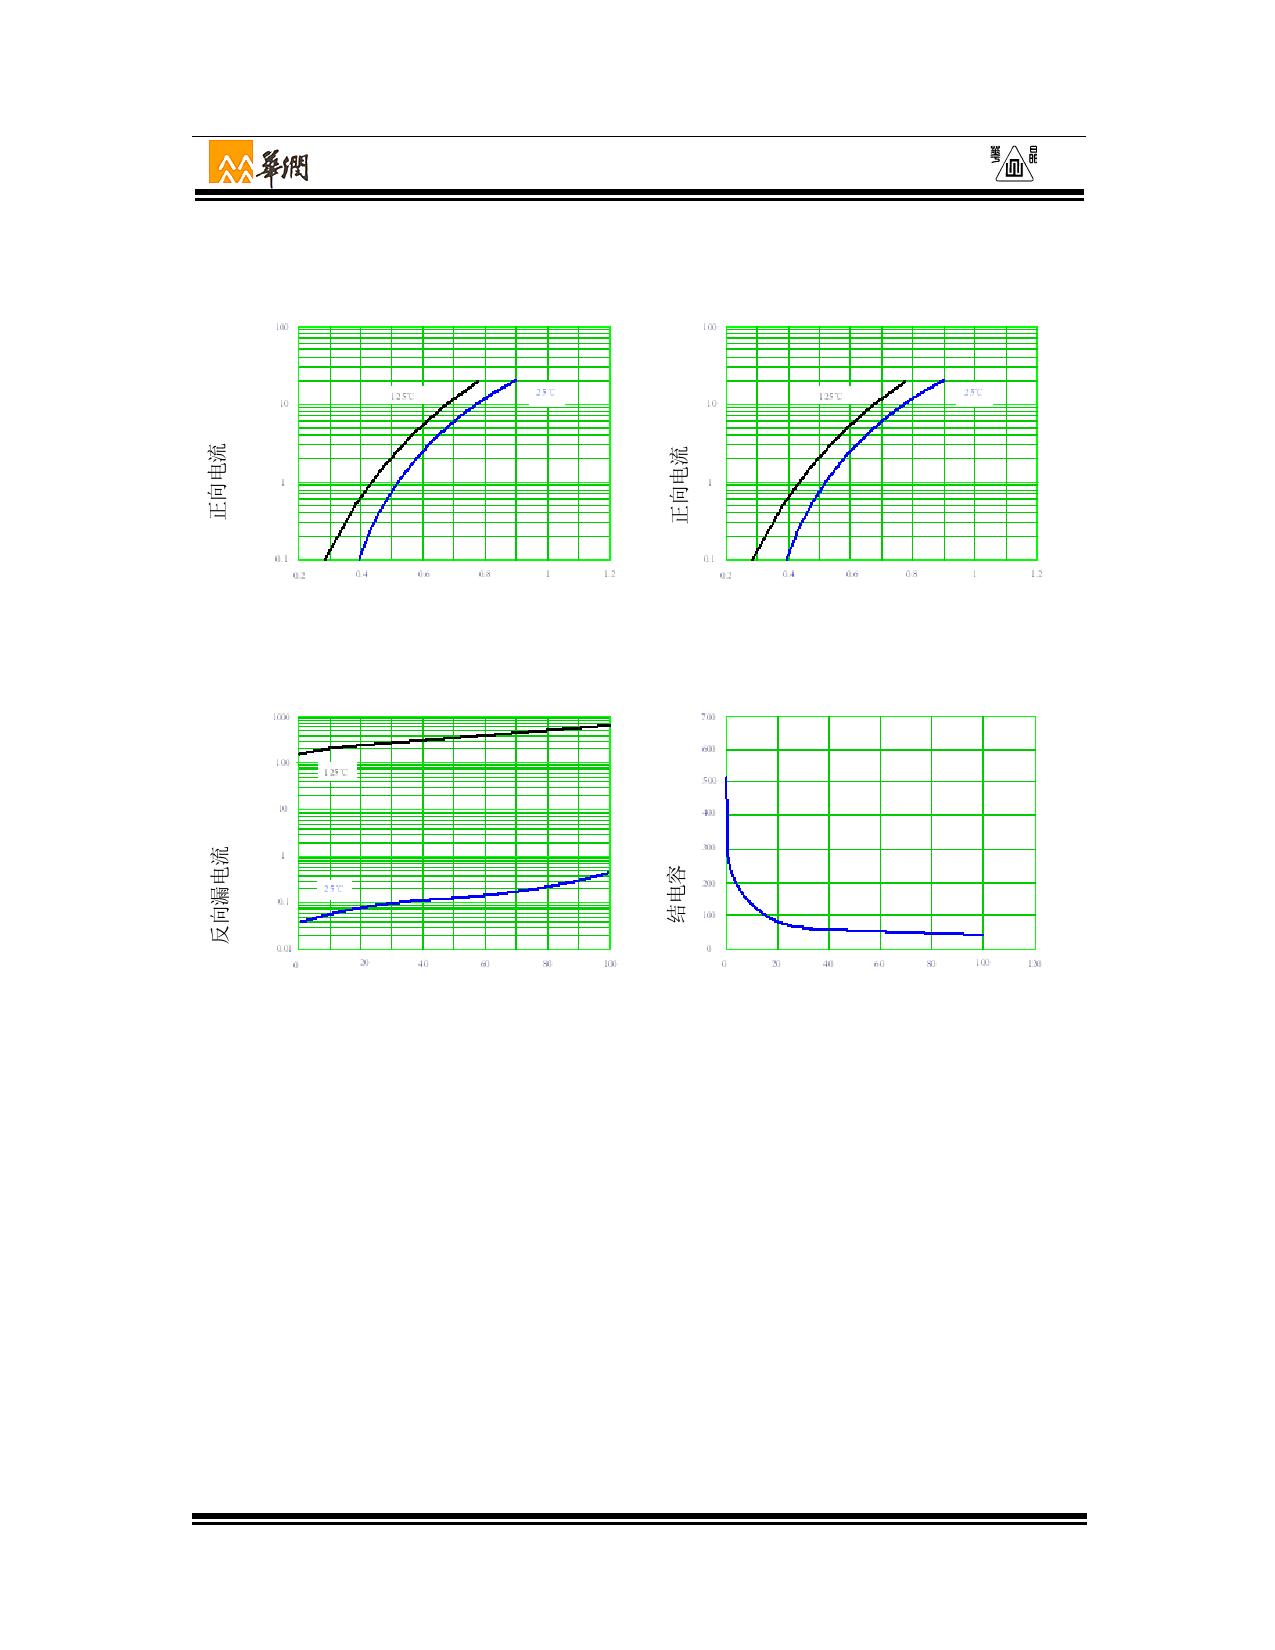 2CZ20100A9S pdf, ピン配列